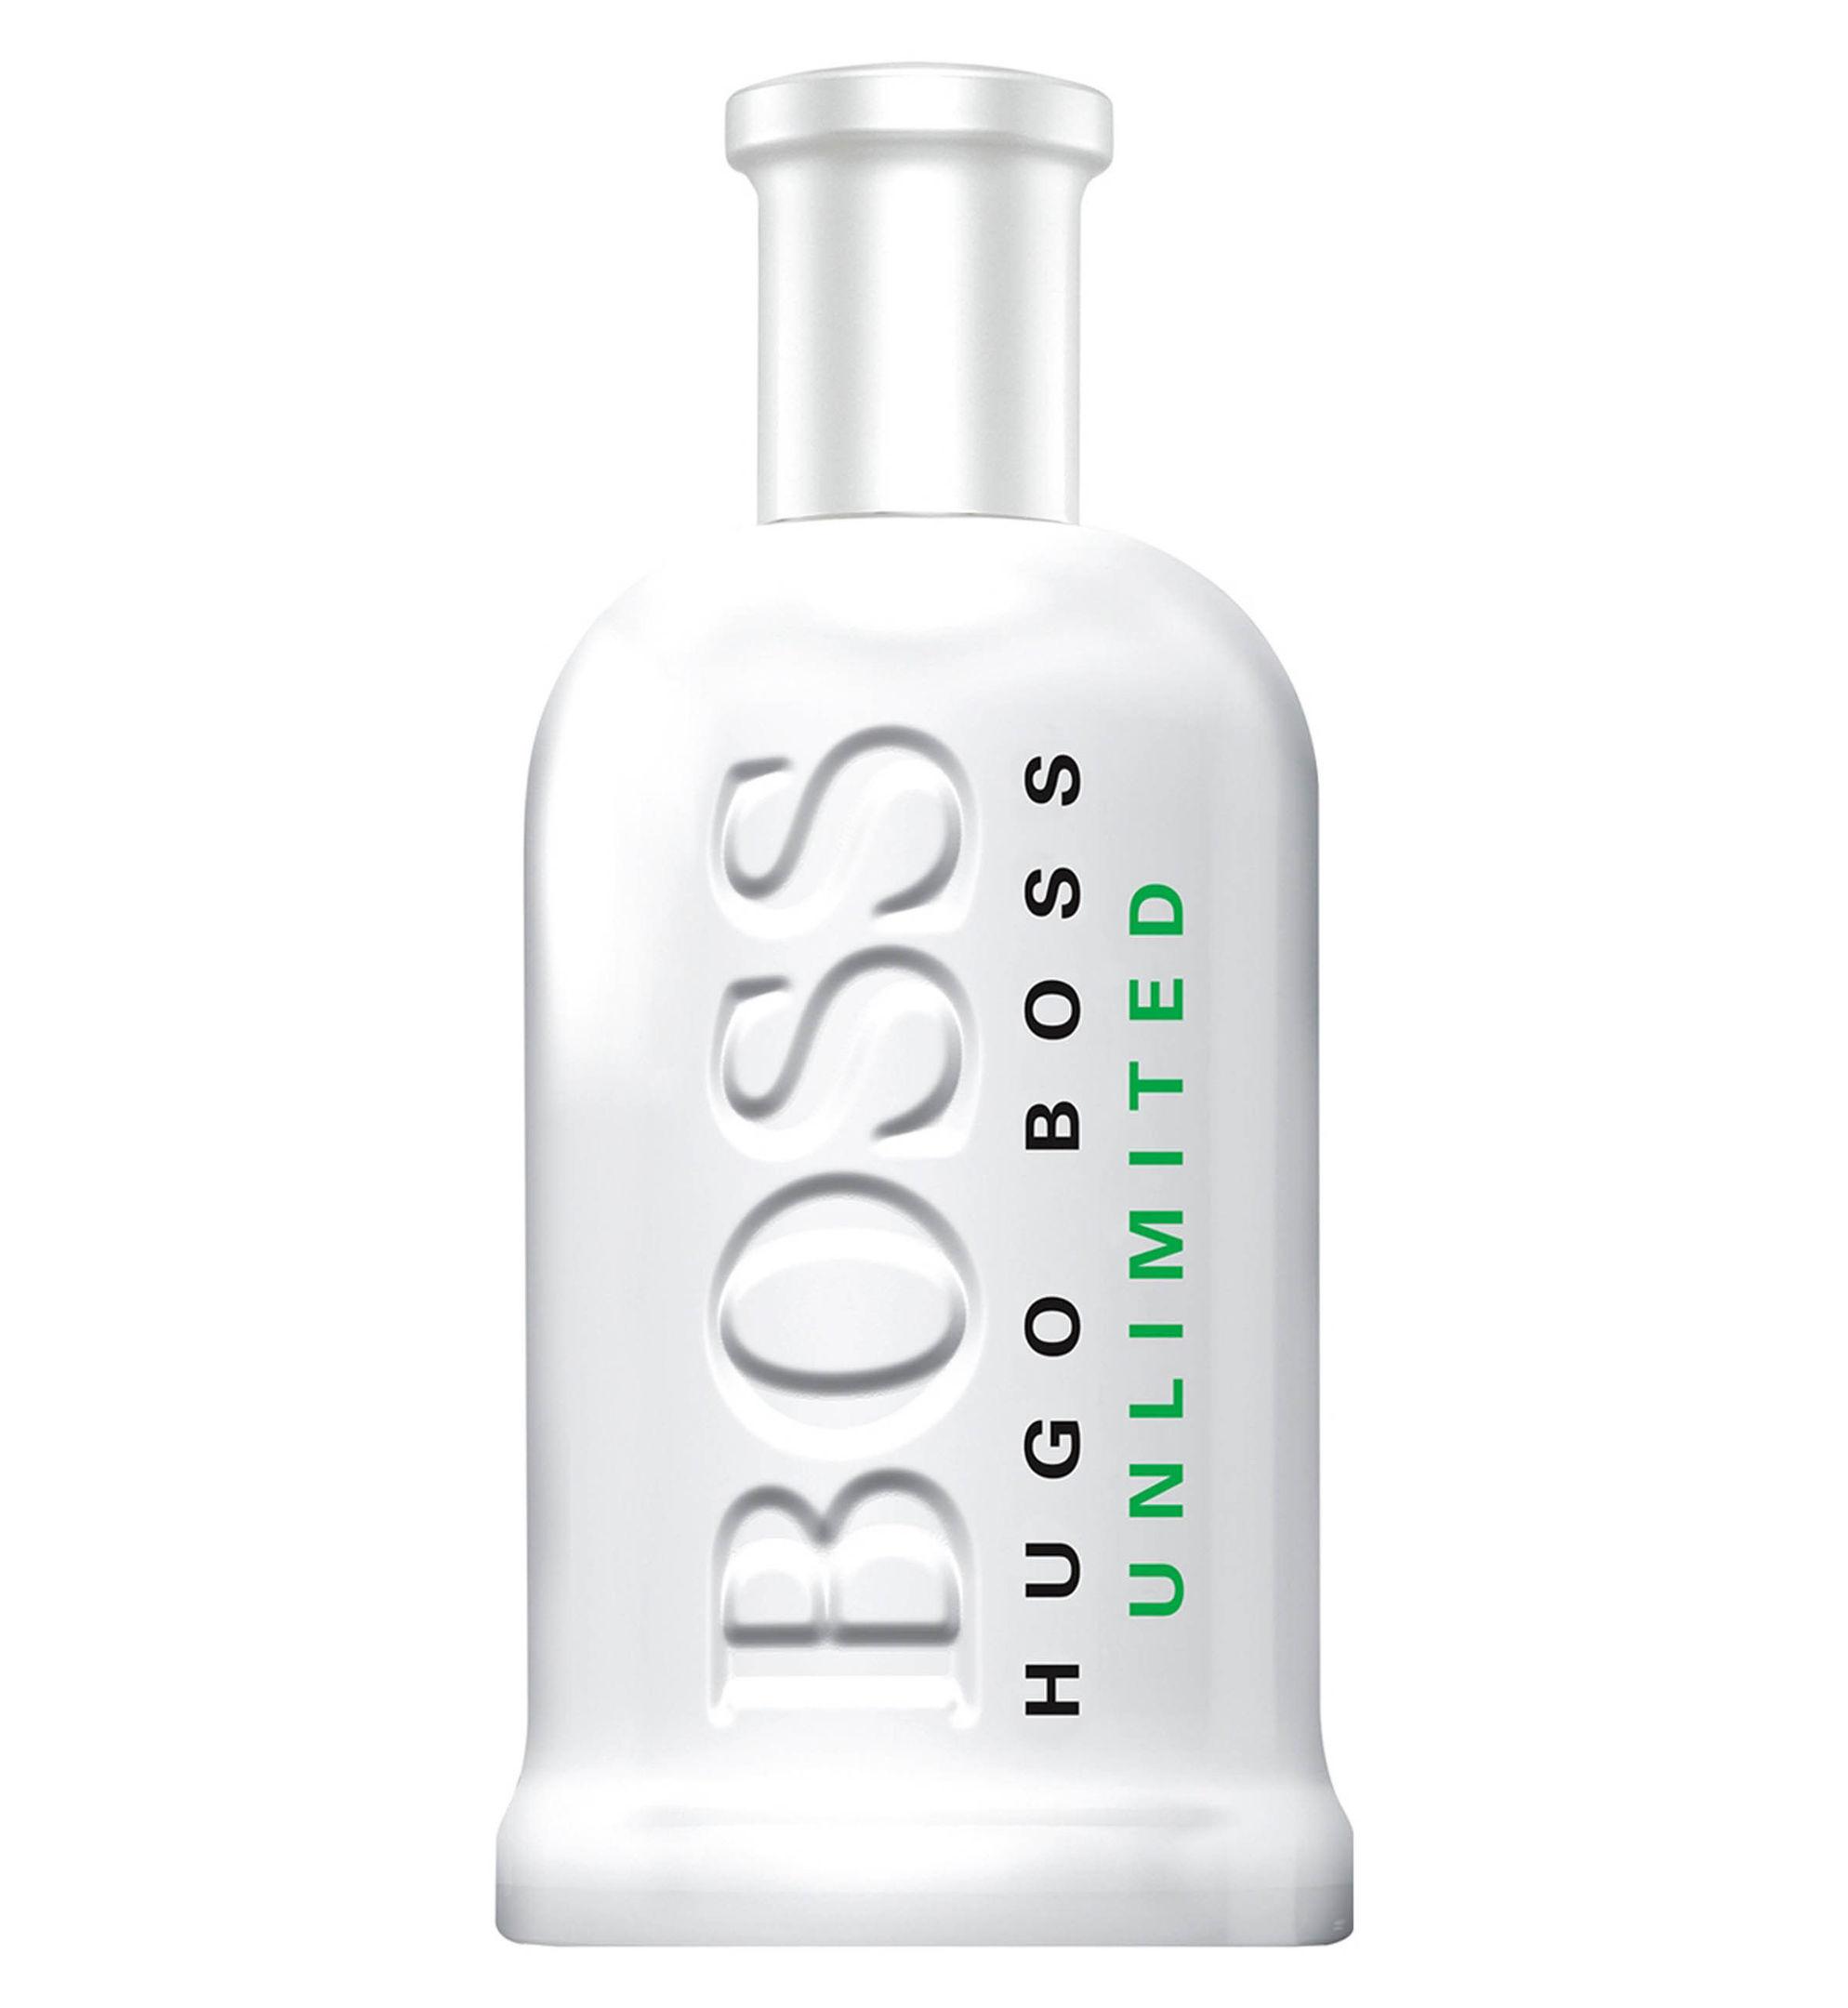 Boss Bottled Unlimited Eau de Toilette, available from Boots. Picture credit: PA Photo/Handout.